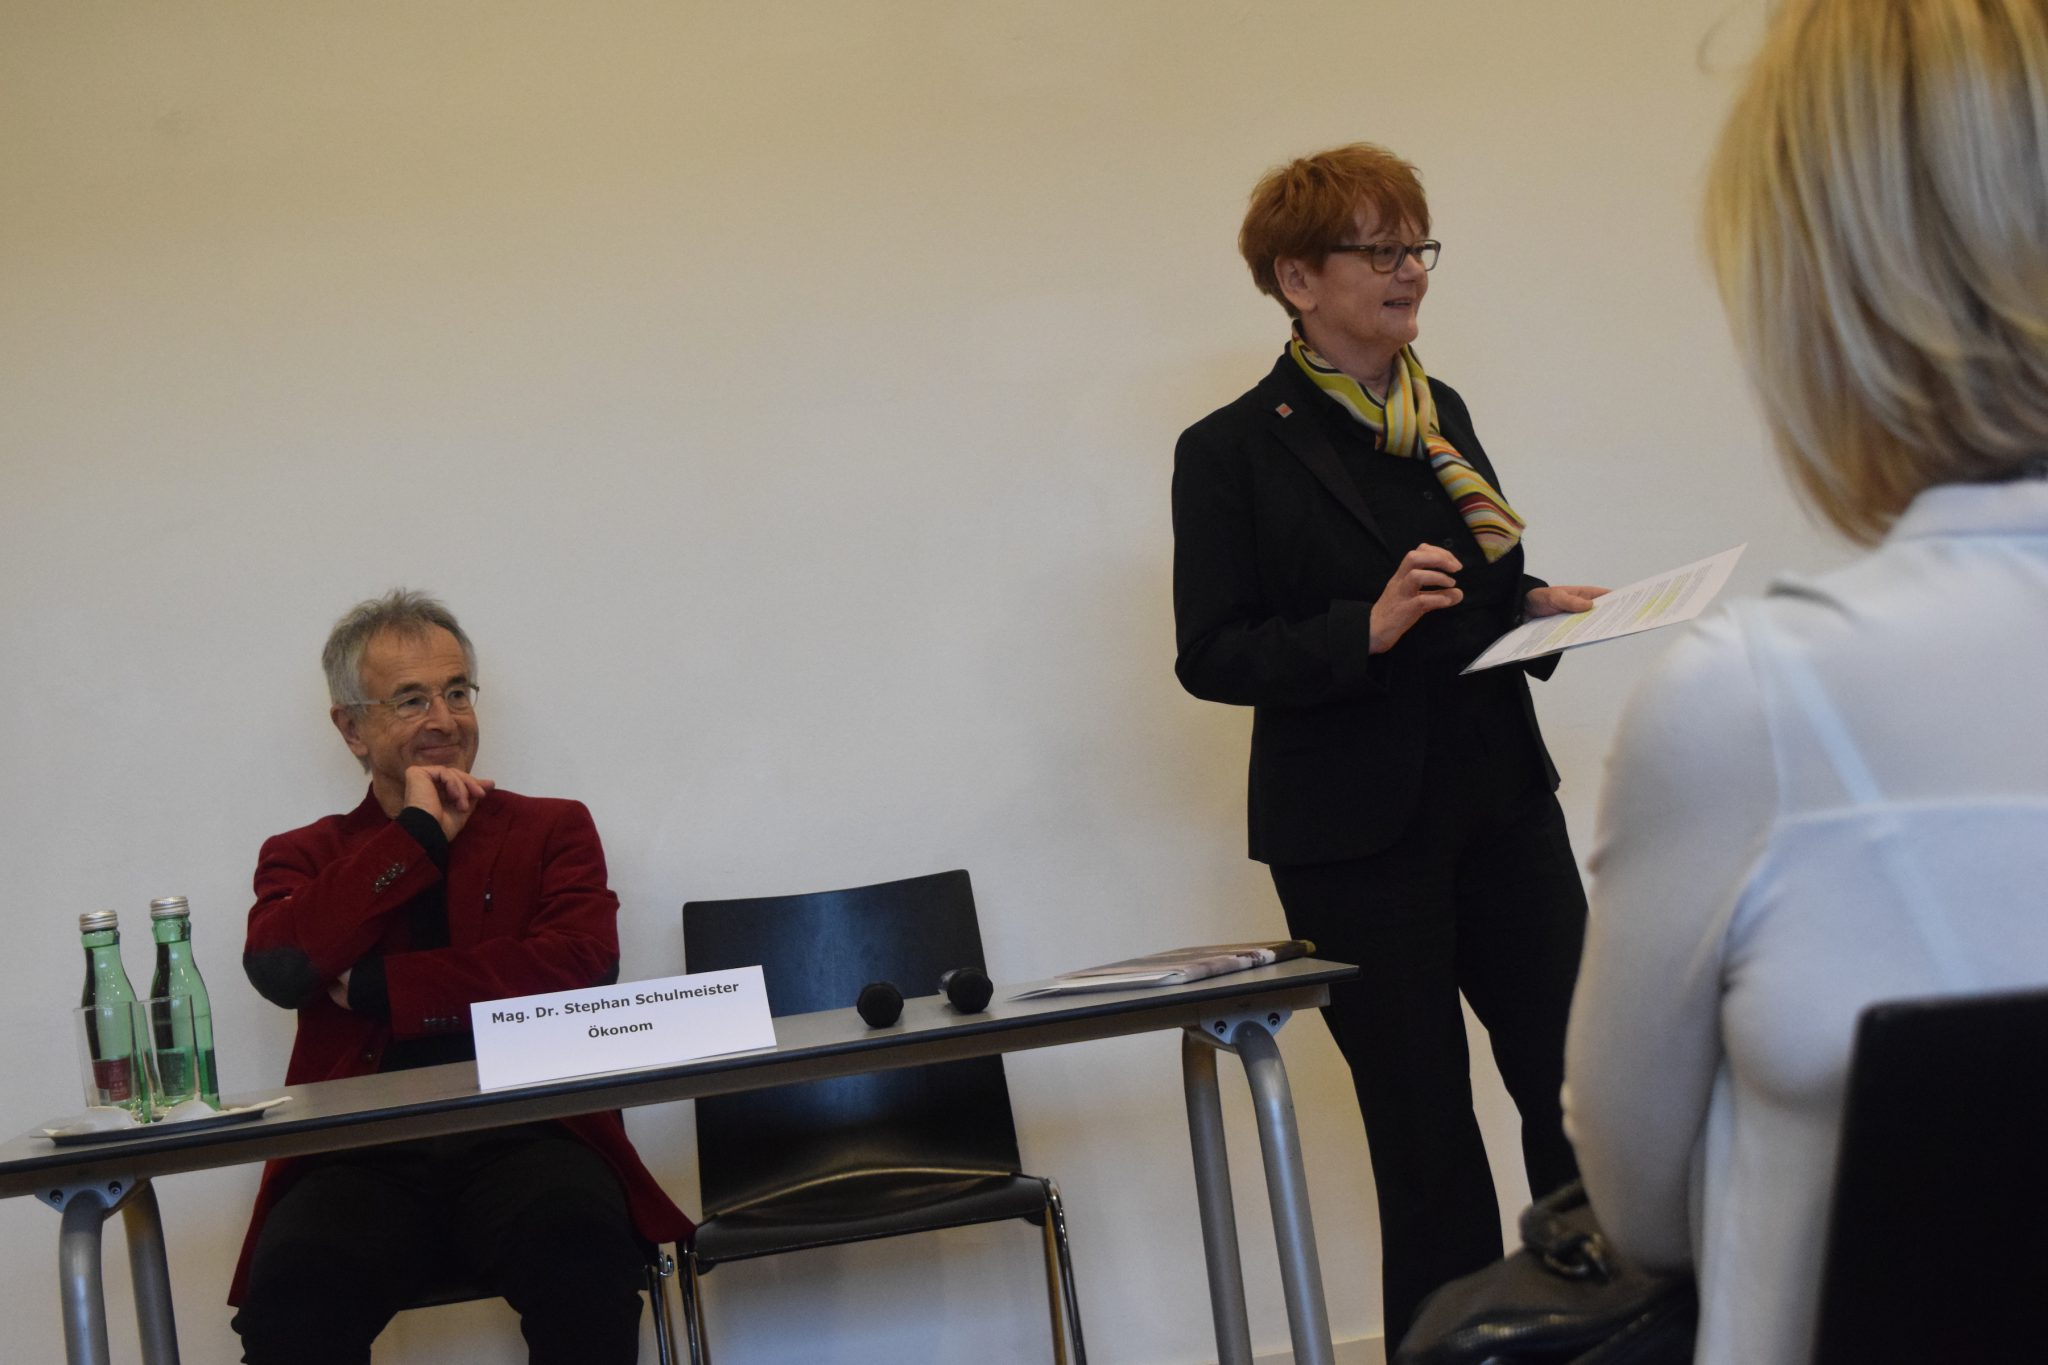 Dr. Stephan Schulmeister, ein Star der österreichischen Ökonomen an den Hertha Firnbergschulen